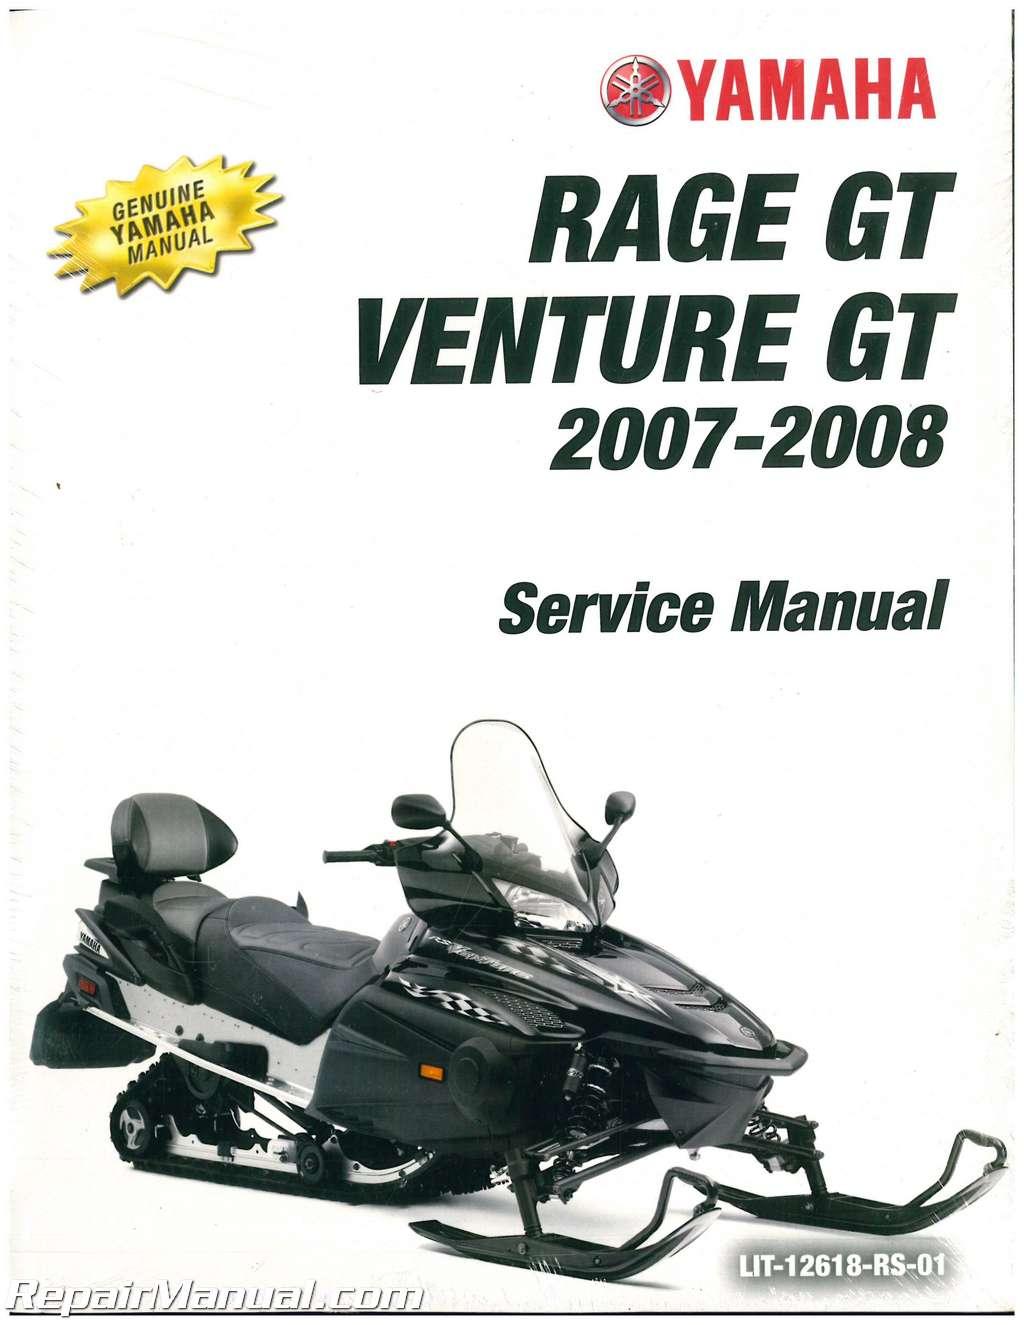 Yamaha Rage Weight